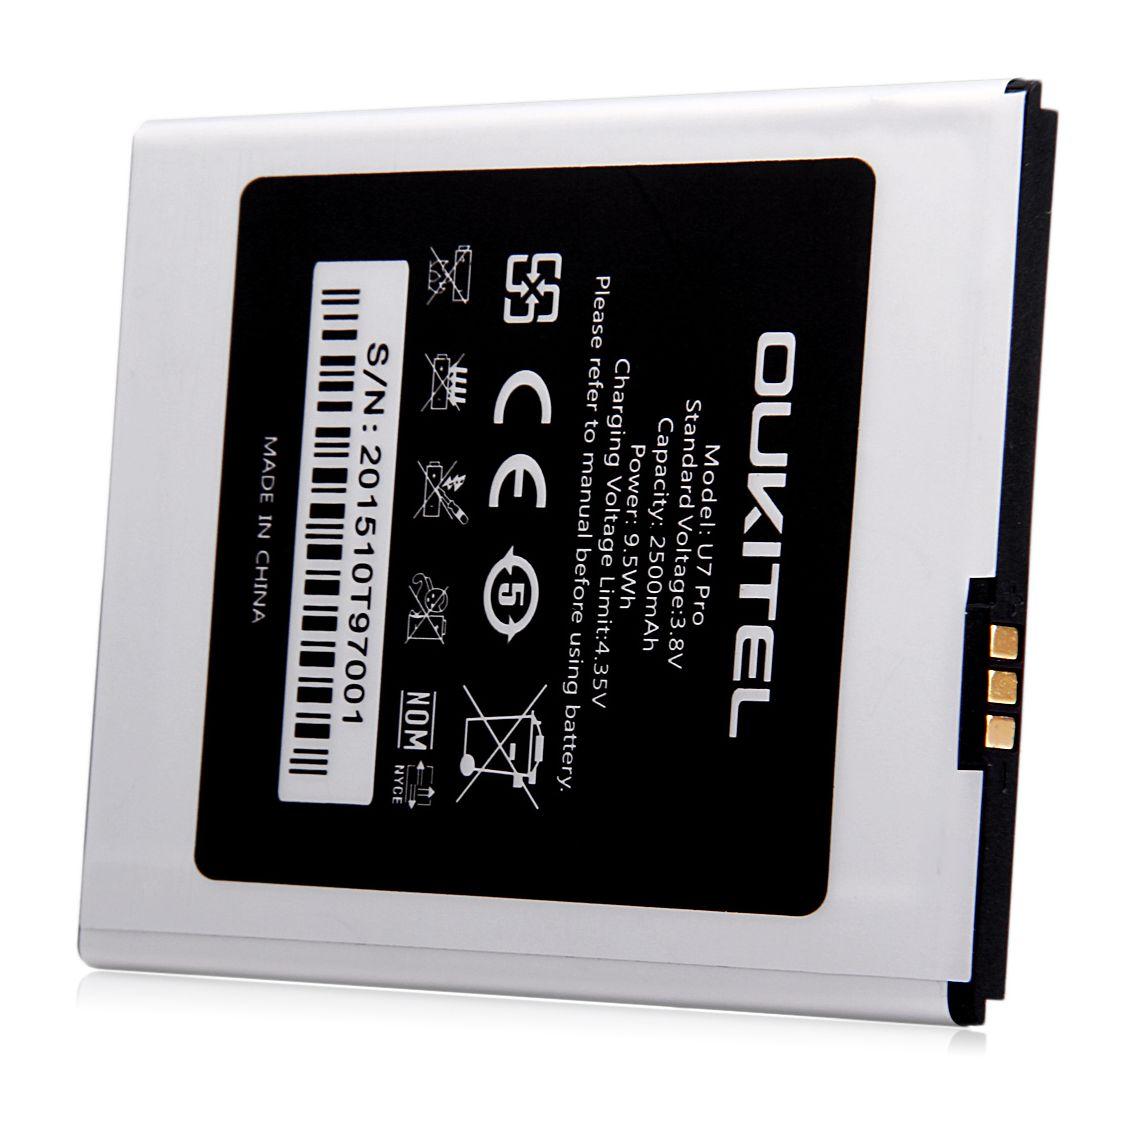 OUKITEL Μπαταρία αντικατάστασης για Smarphone U7 Pro - OUKITEL 9602